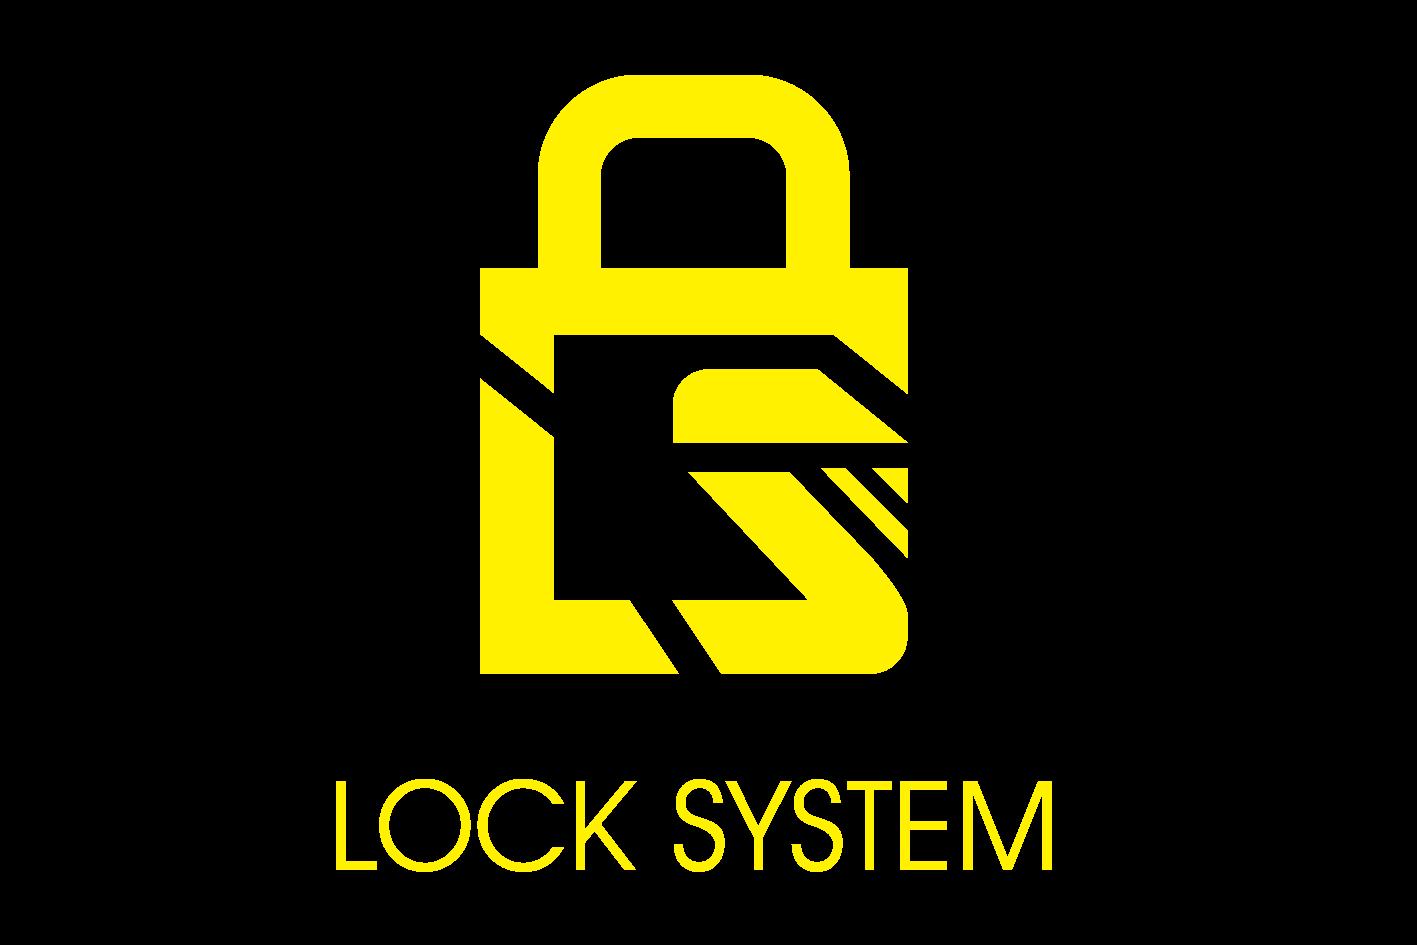 LOCK MODE